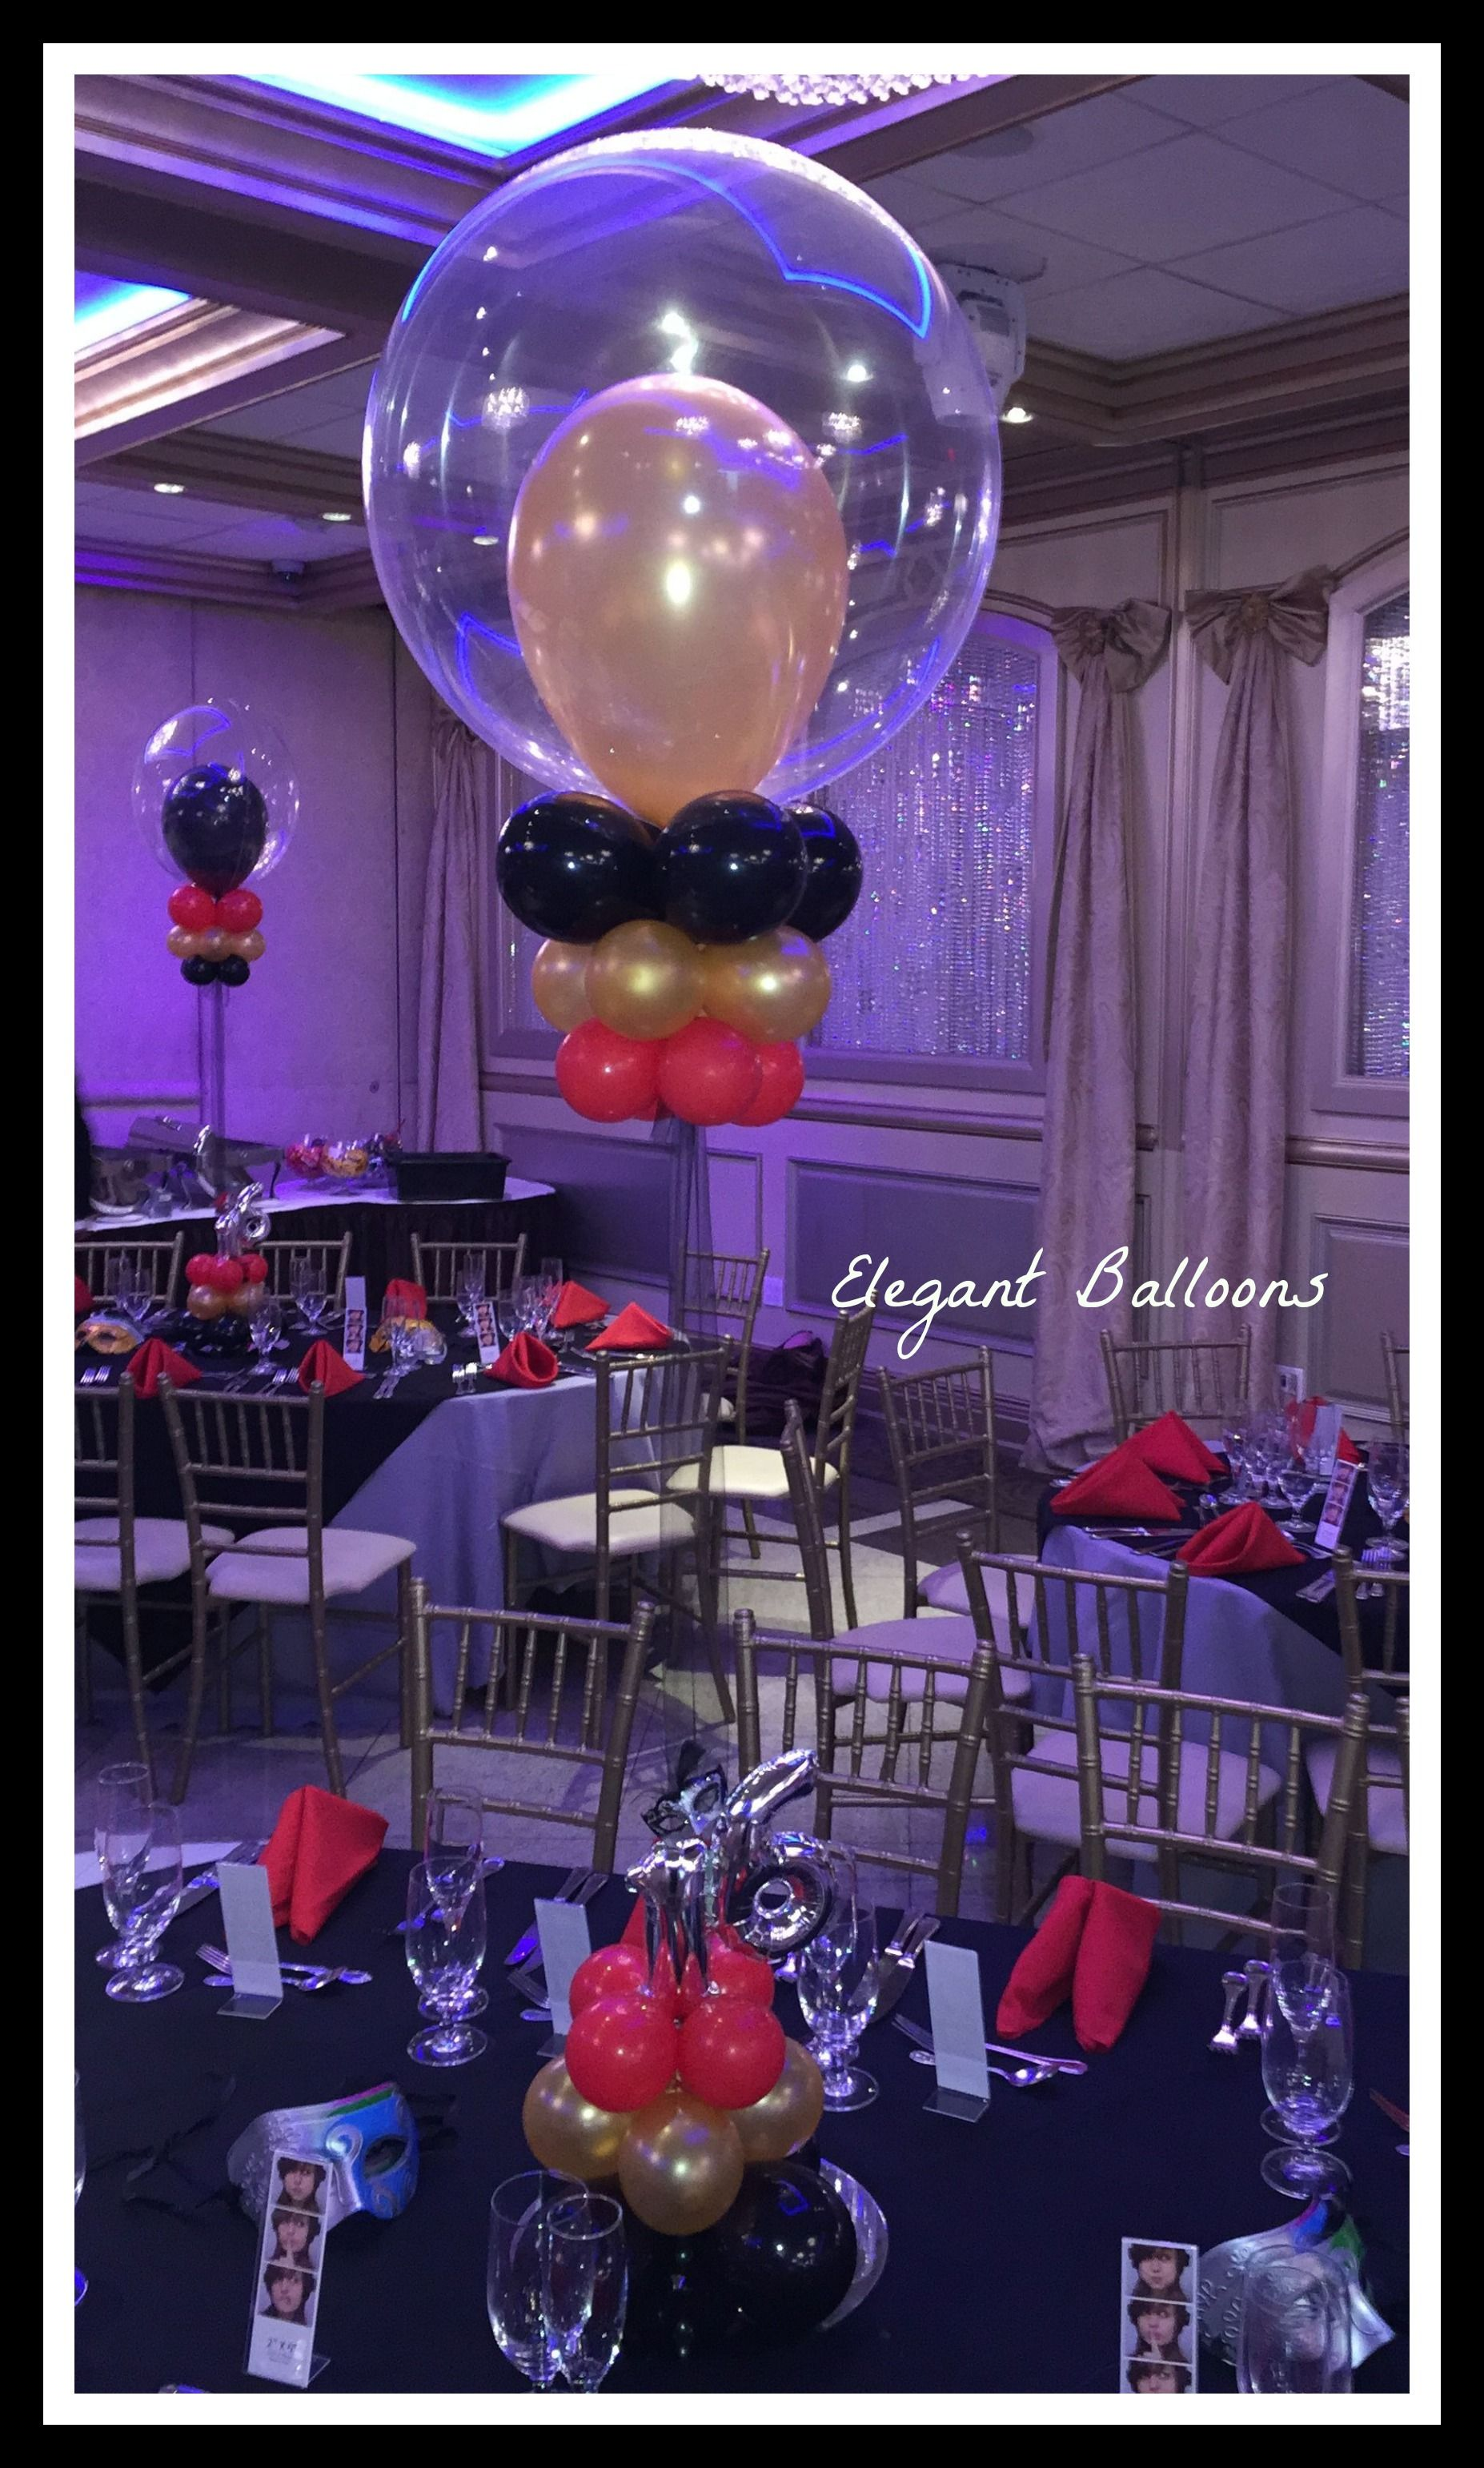 www.elegant-balloons.com | Sweet 16 decorations, Balloons ...